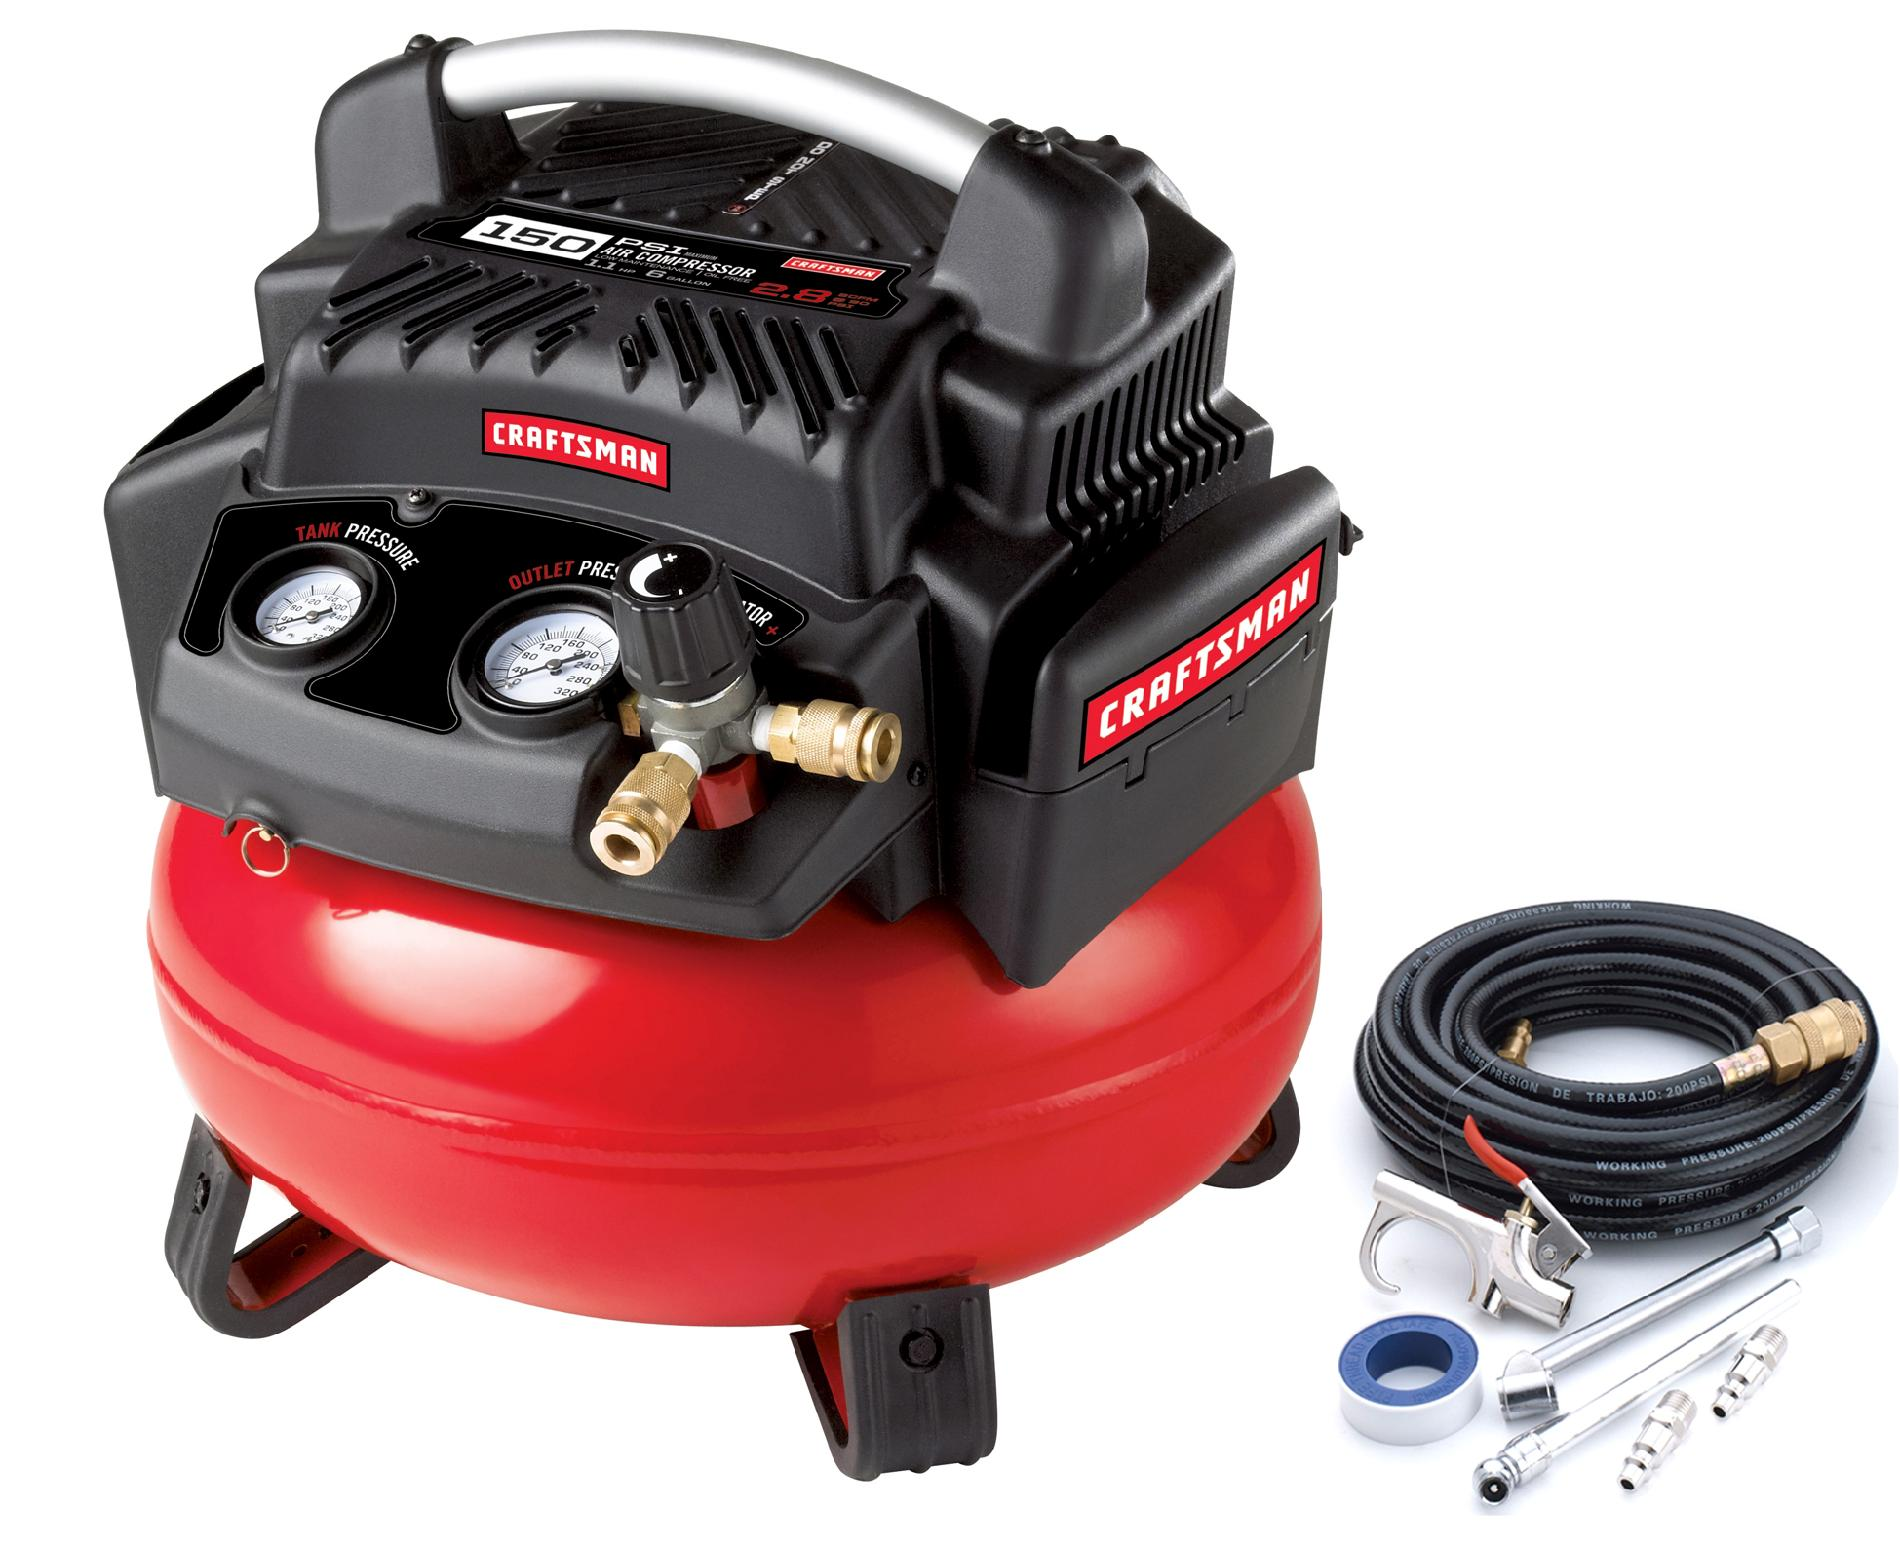 Craftsman 6 Gallon 1.1 Hp Oil-free Pancake Compressor 150